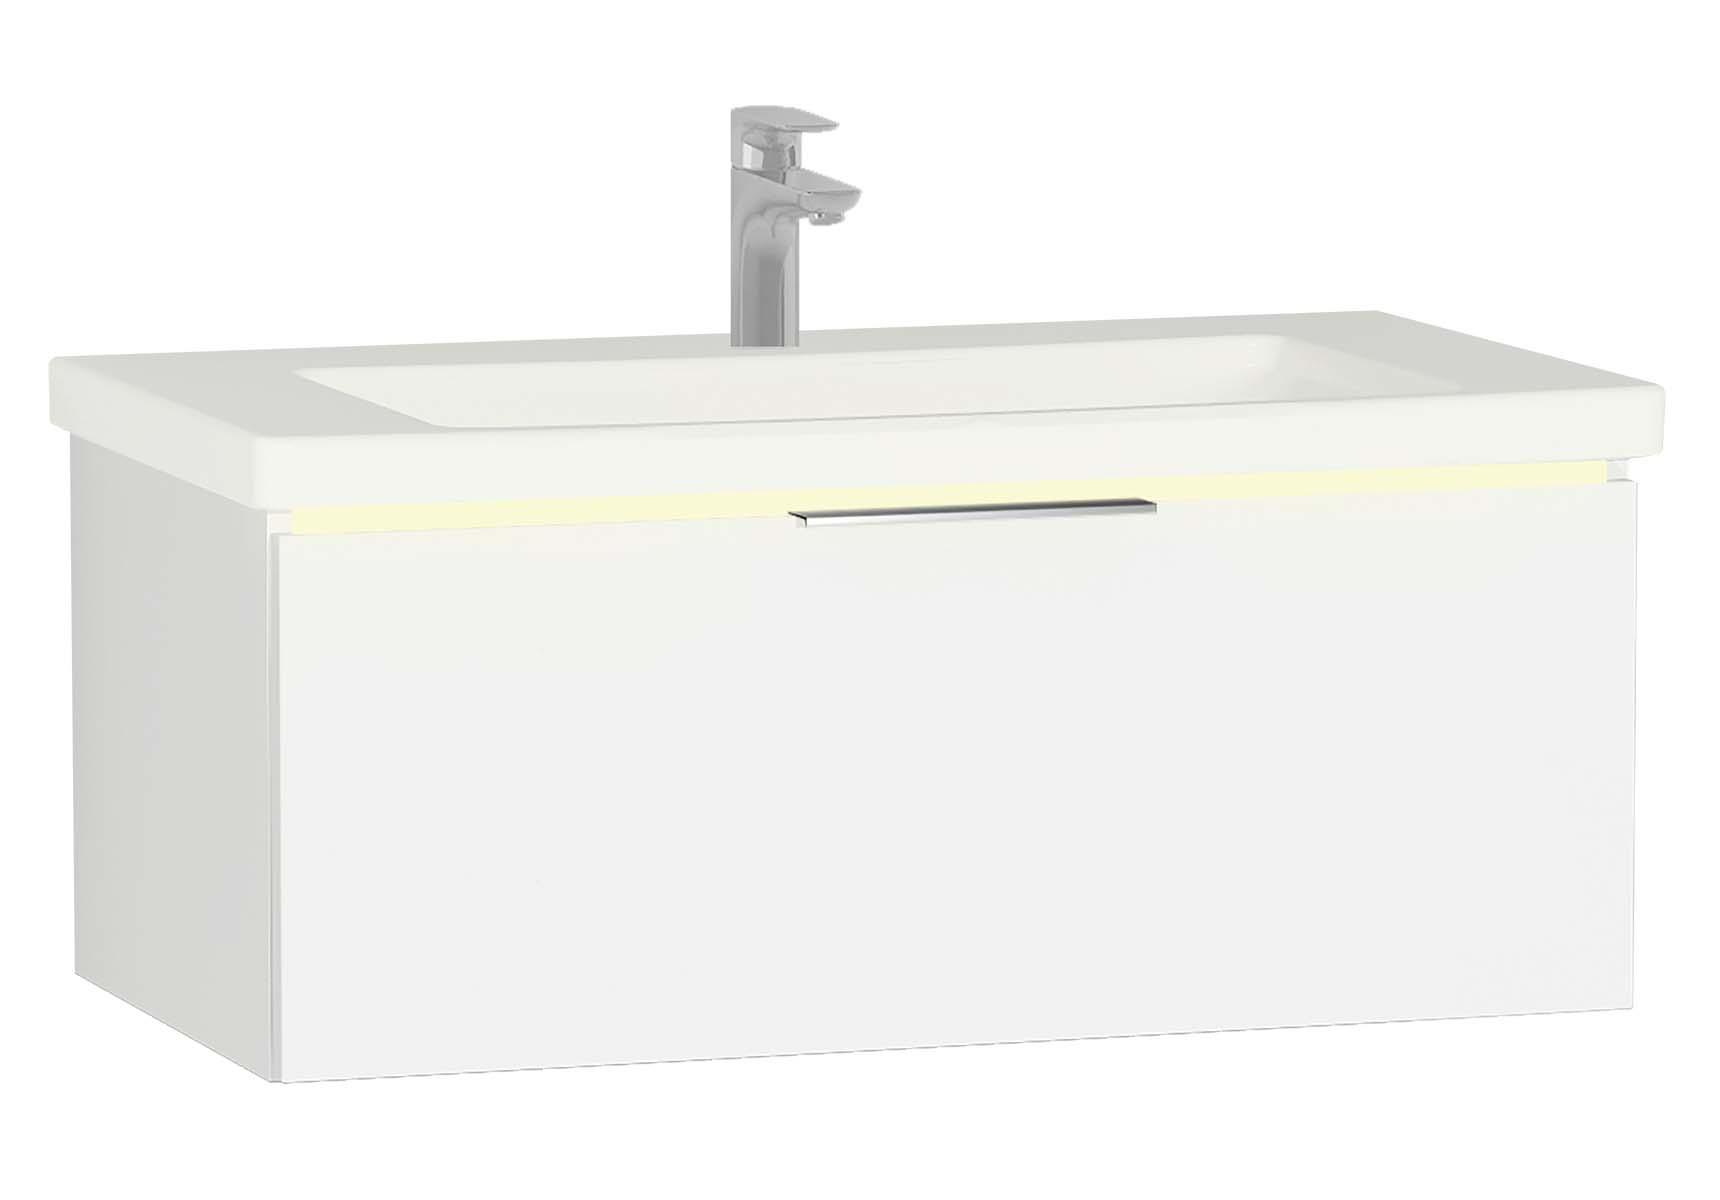 Central Washbasin Unit with 1 drawer, 90 cm, White High Gloss, Ceramic Washbasin, Led